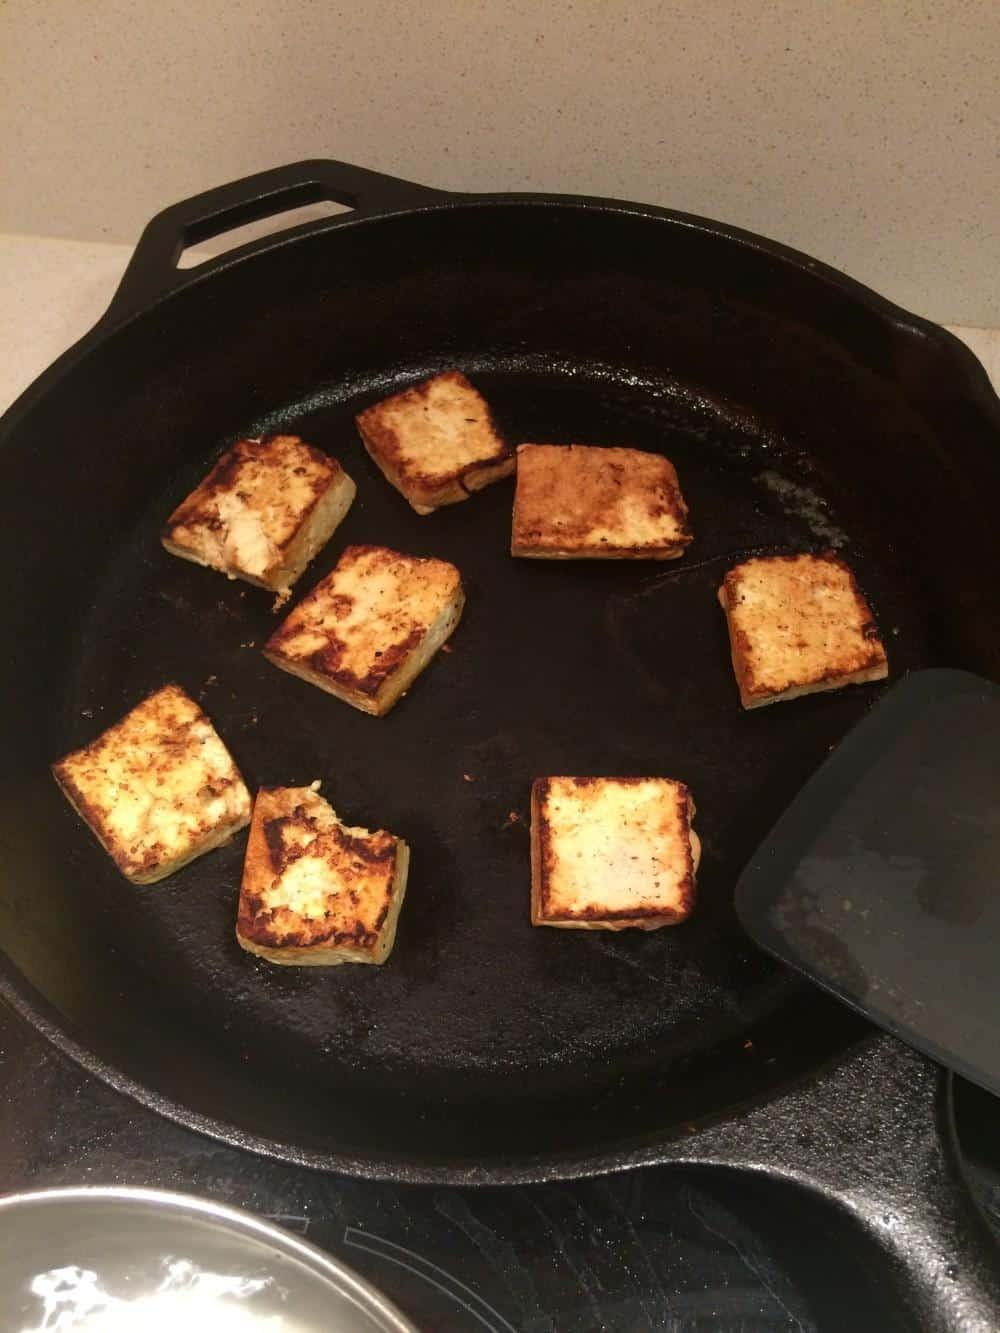 Browning tofu